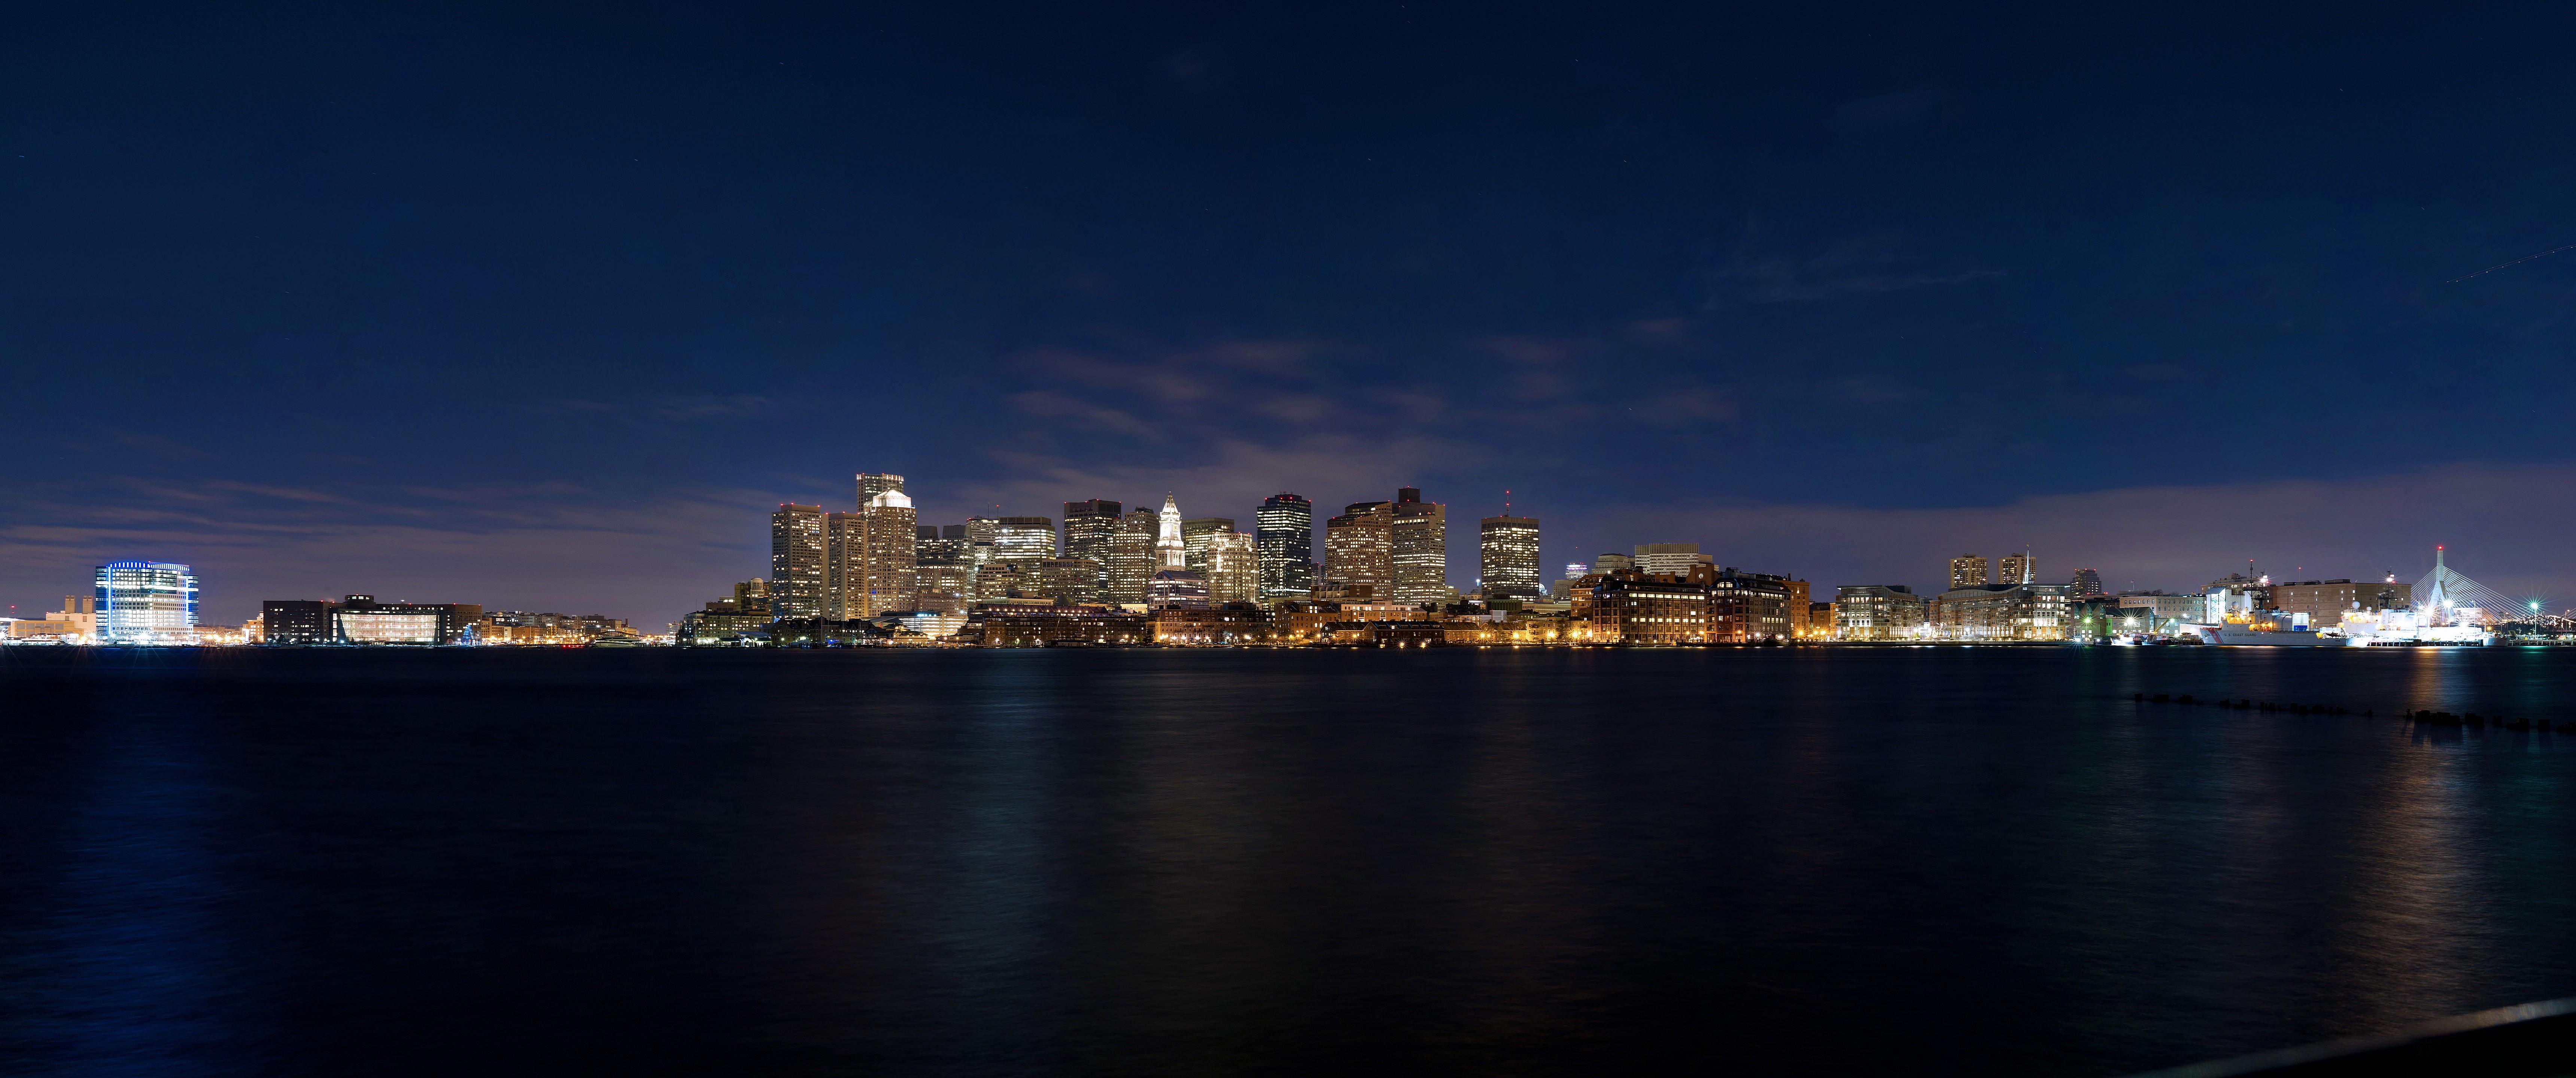 Download 6880x2880 boston skyline